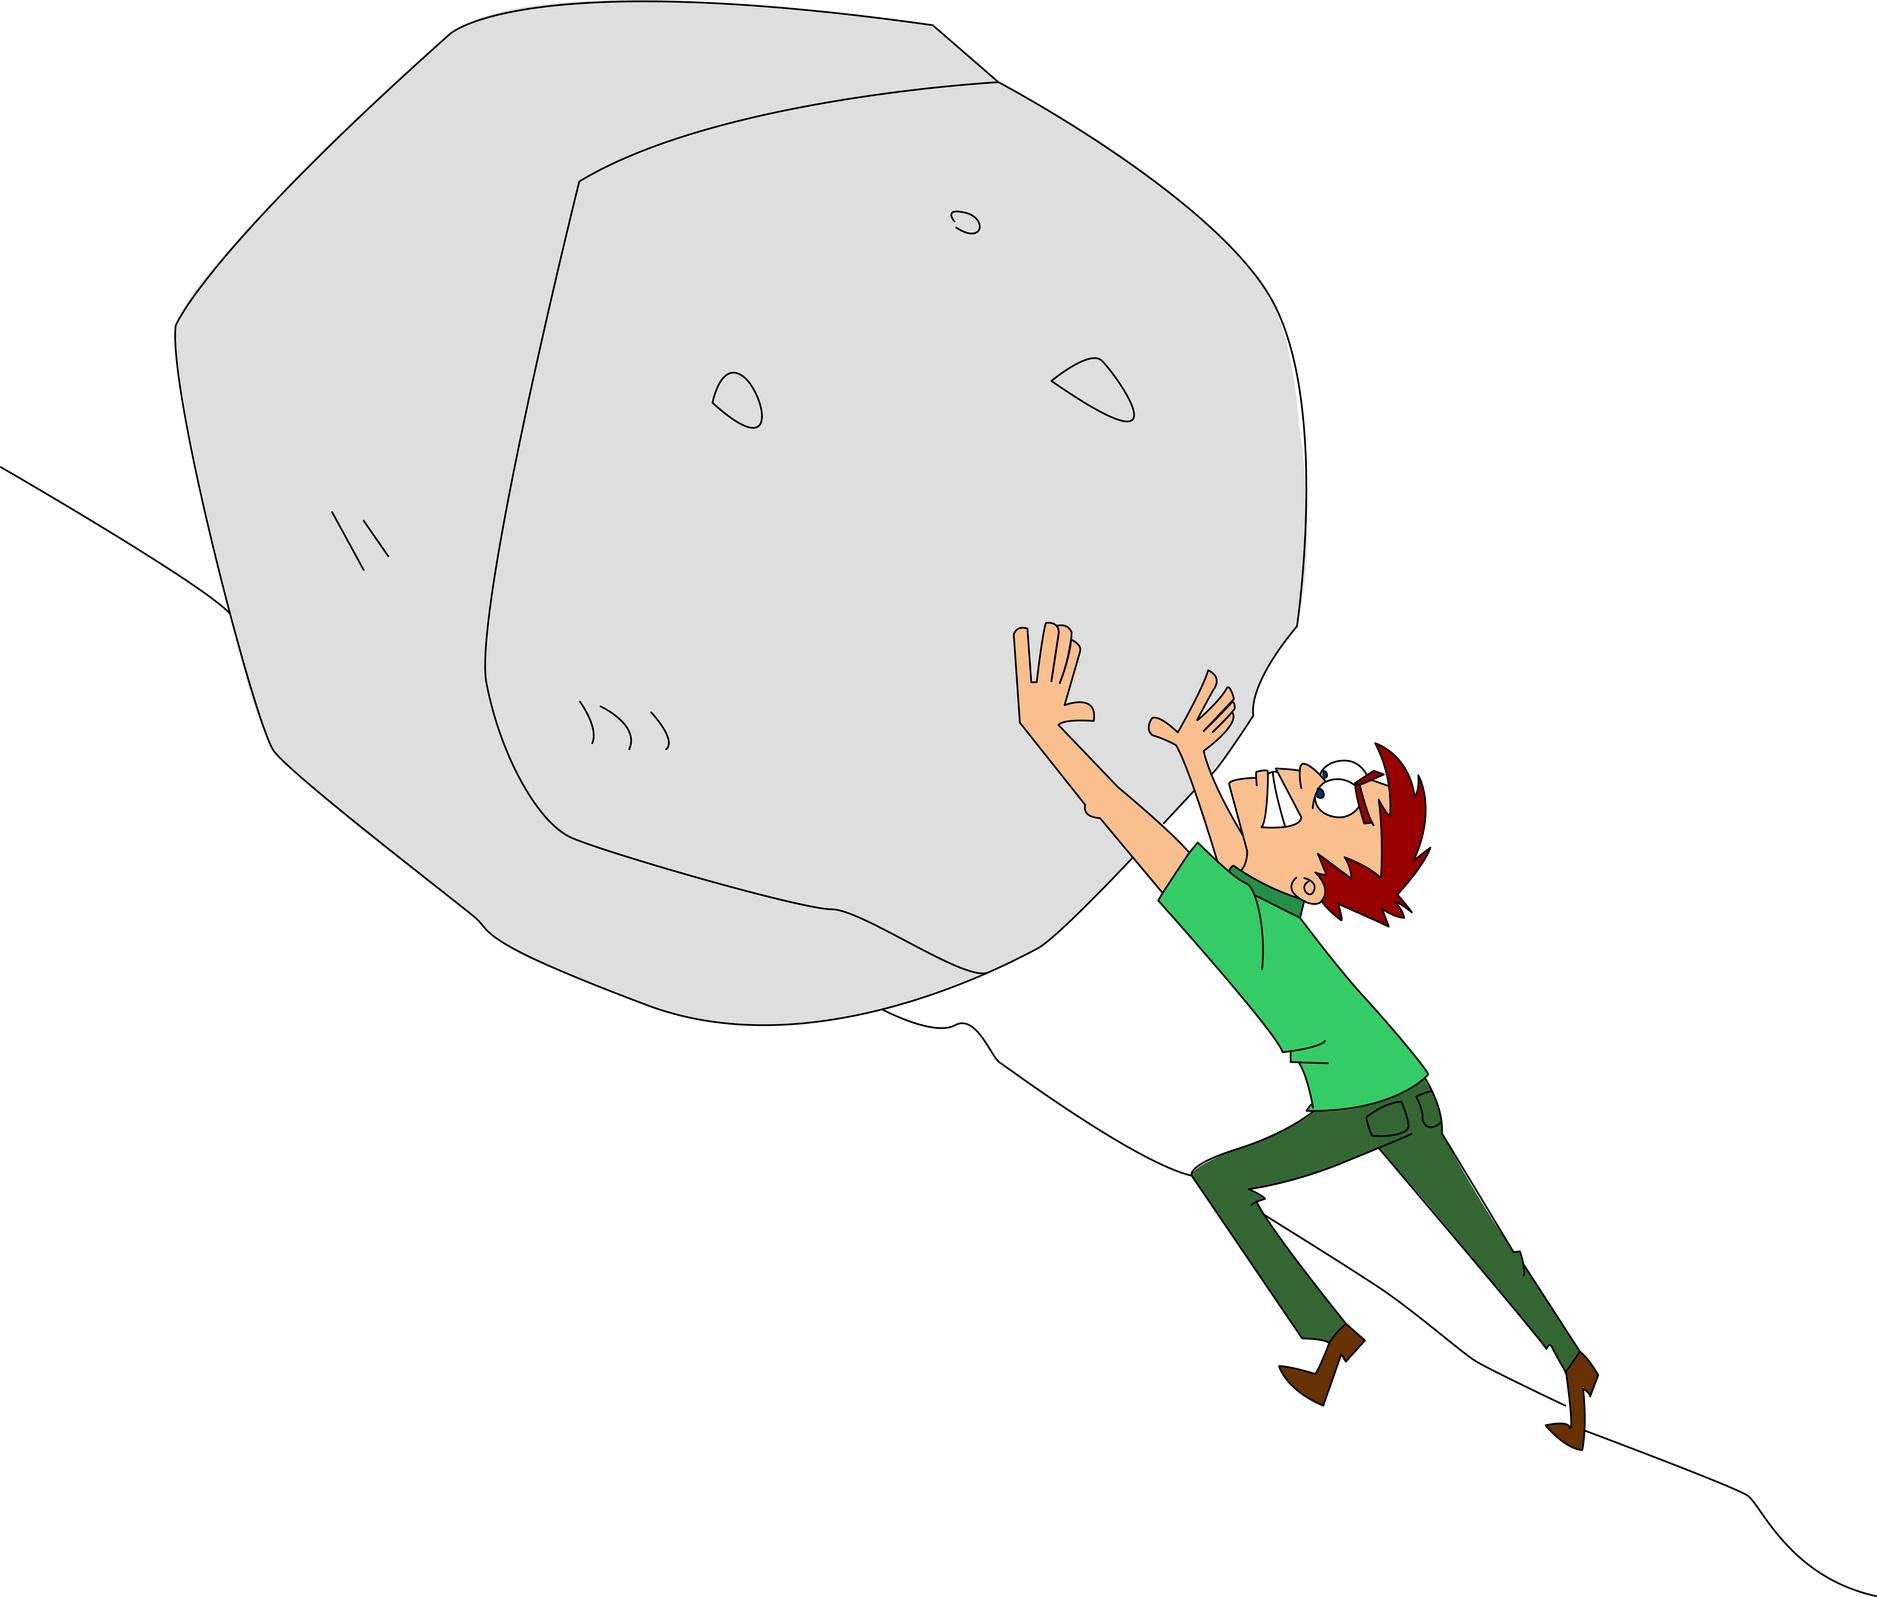 dreamstime_m_40156468.pushing boulder cartoon